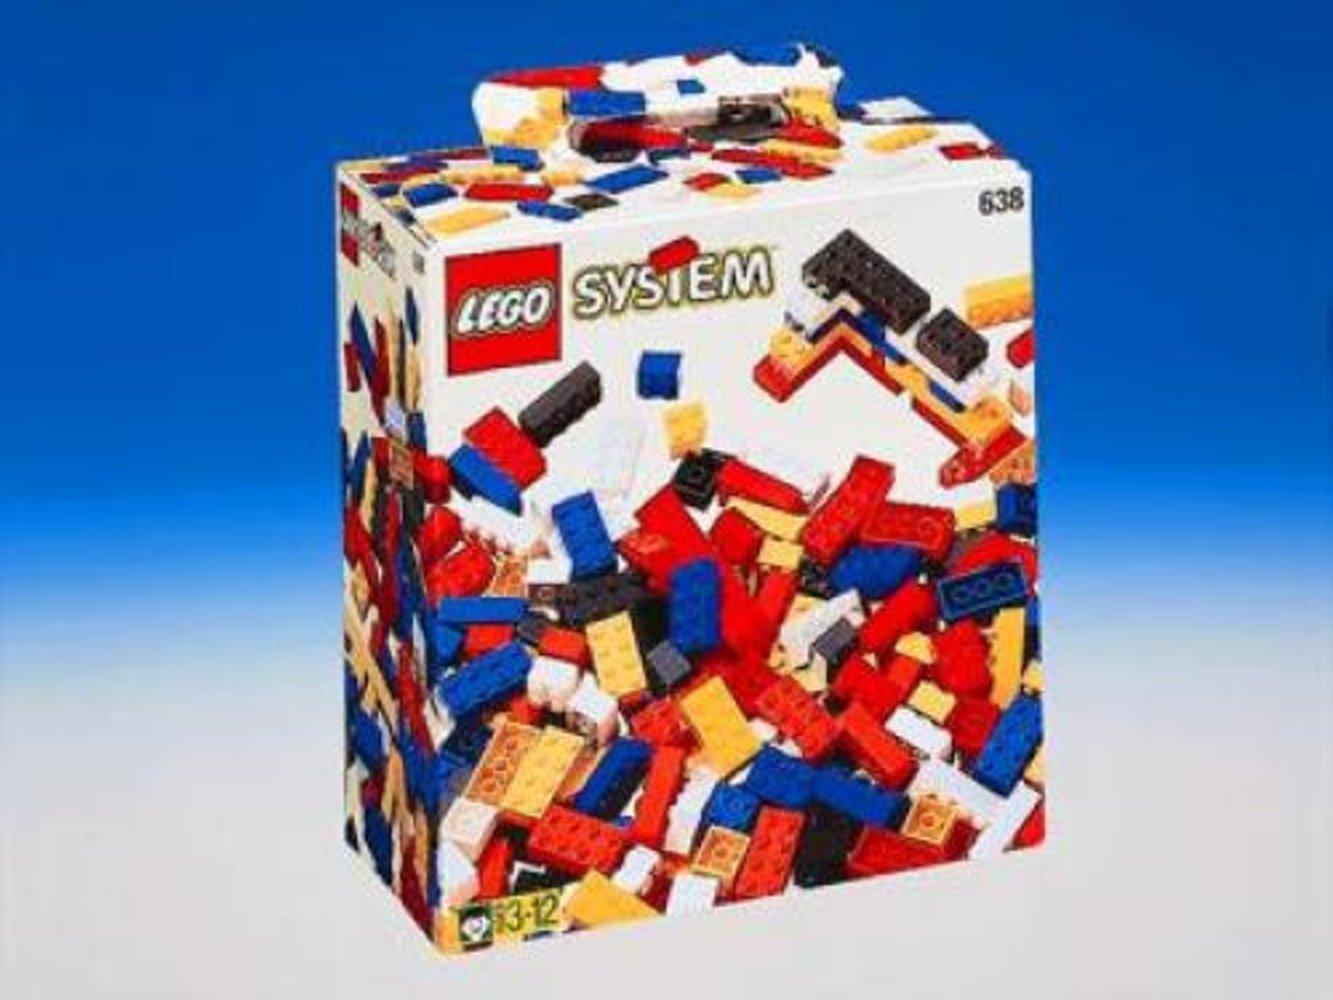 Lots of Extra Basic Bricks, 3+